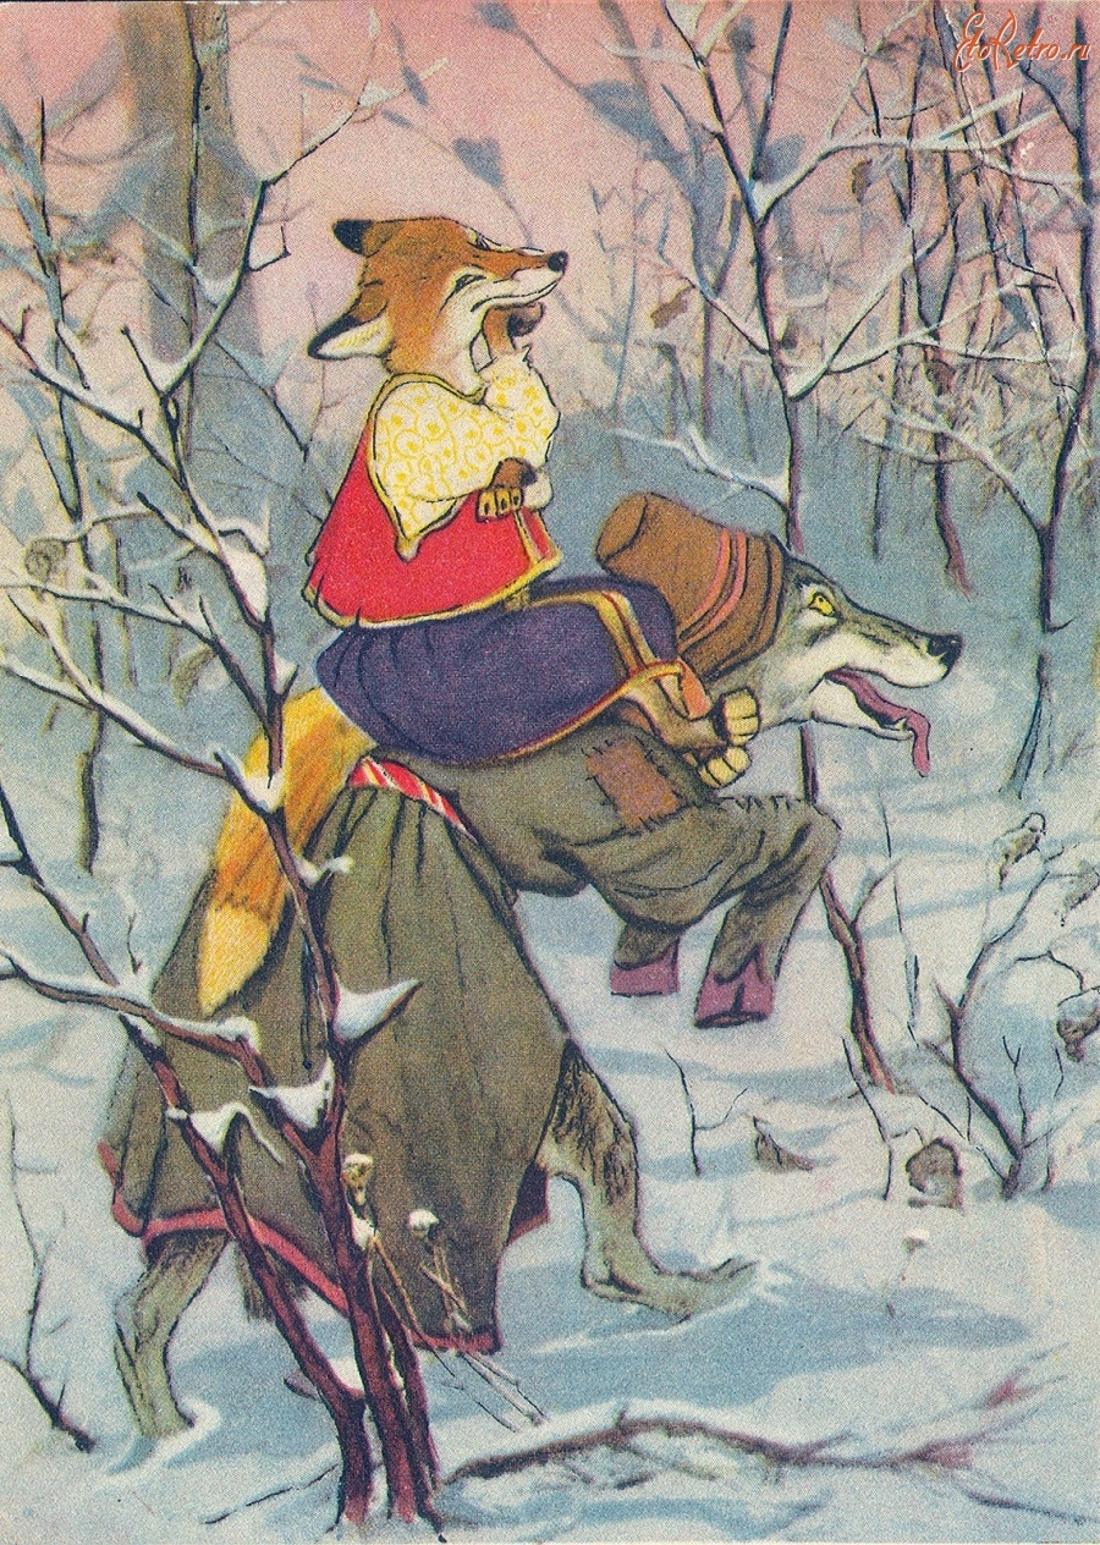 Лиса и Волк - картинка №10046 | Printonic.ru